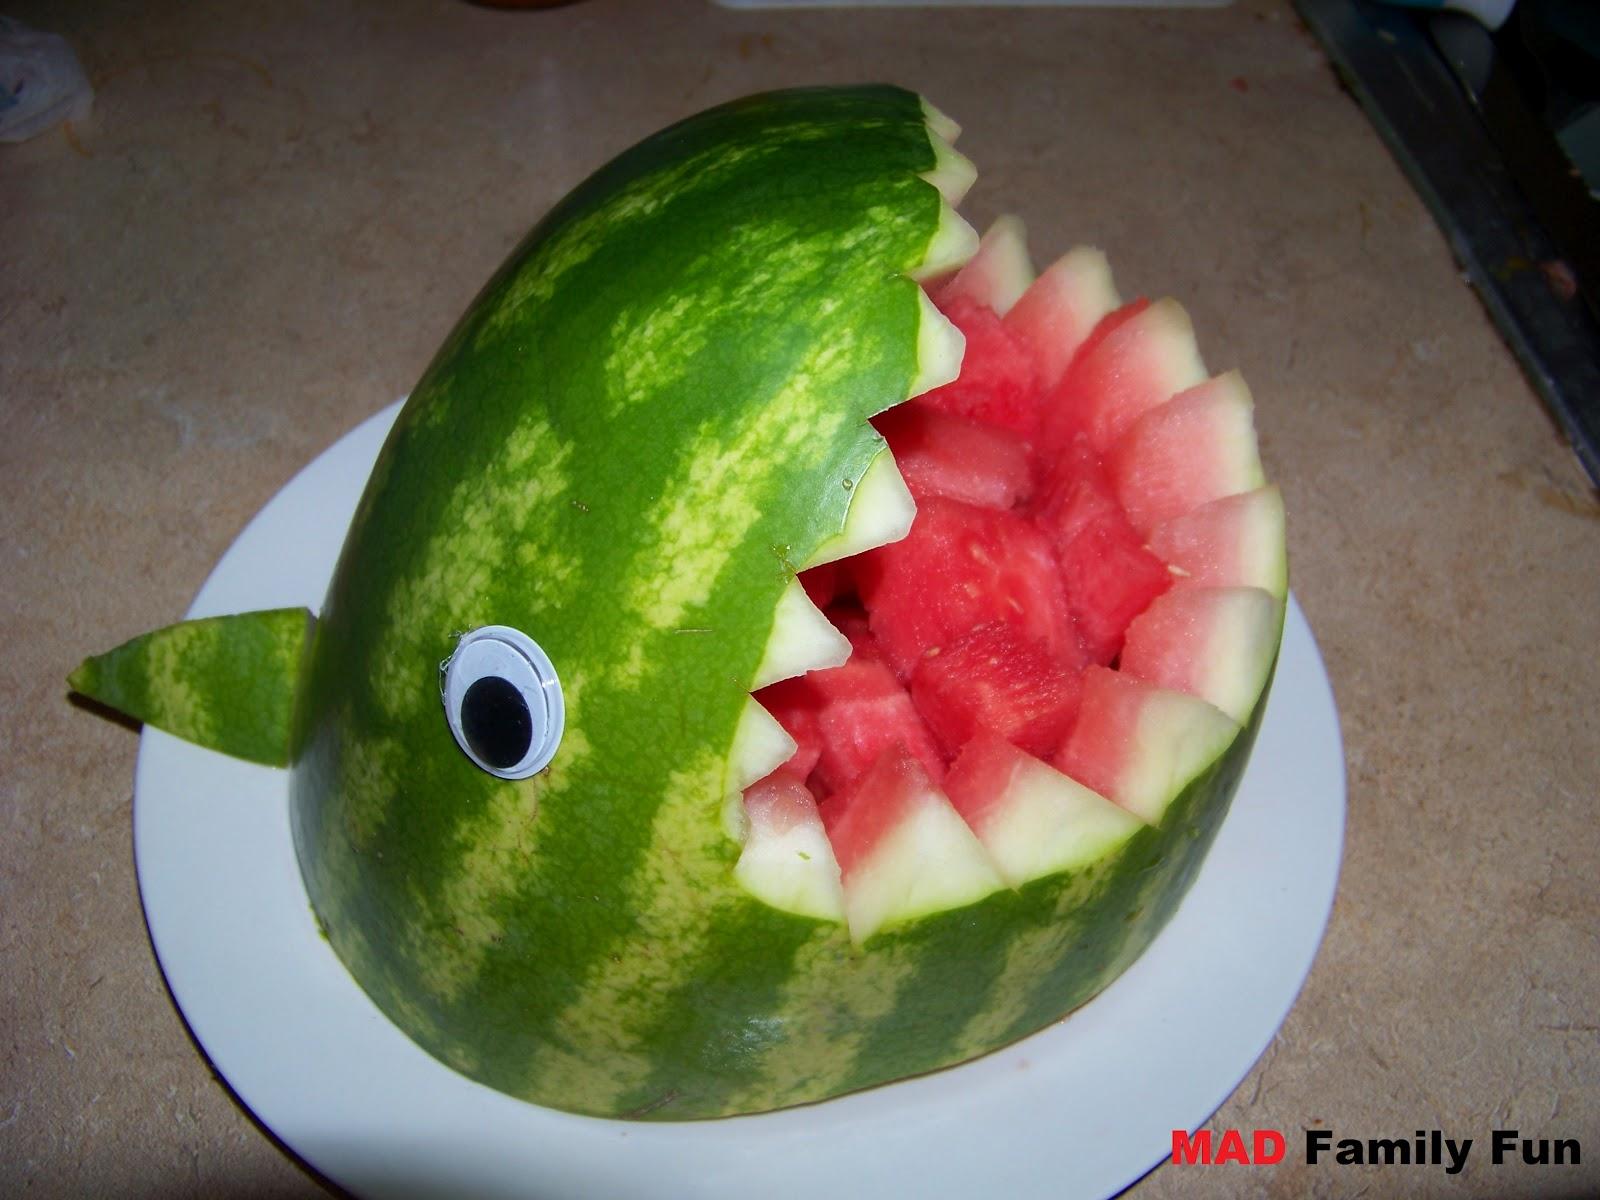 Mad family fun shark watermelon anyone can make this